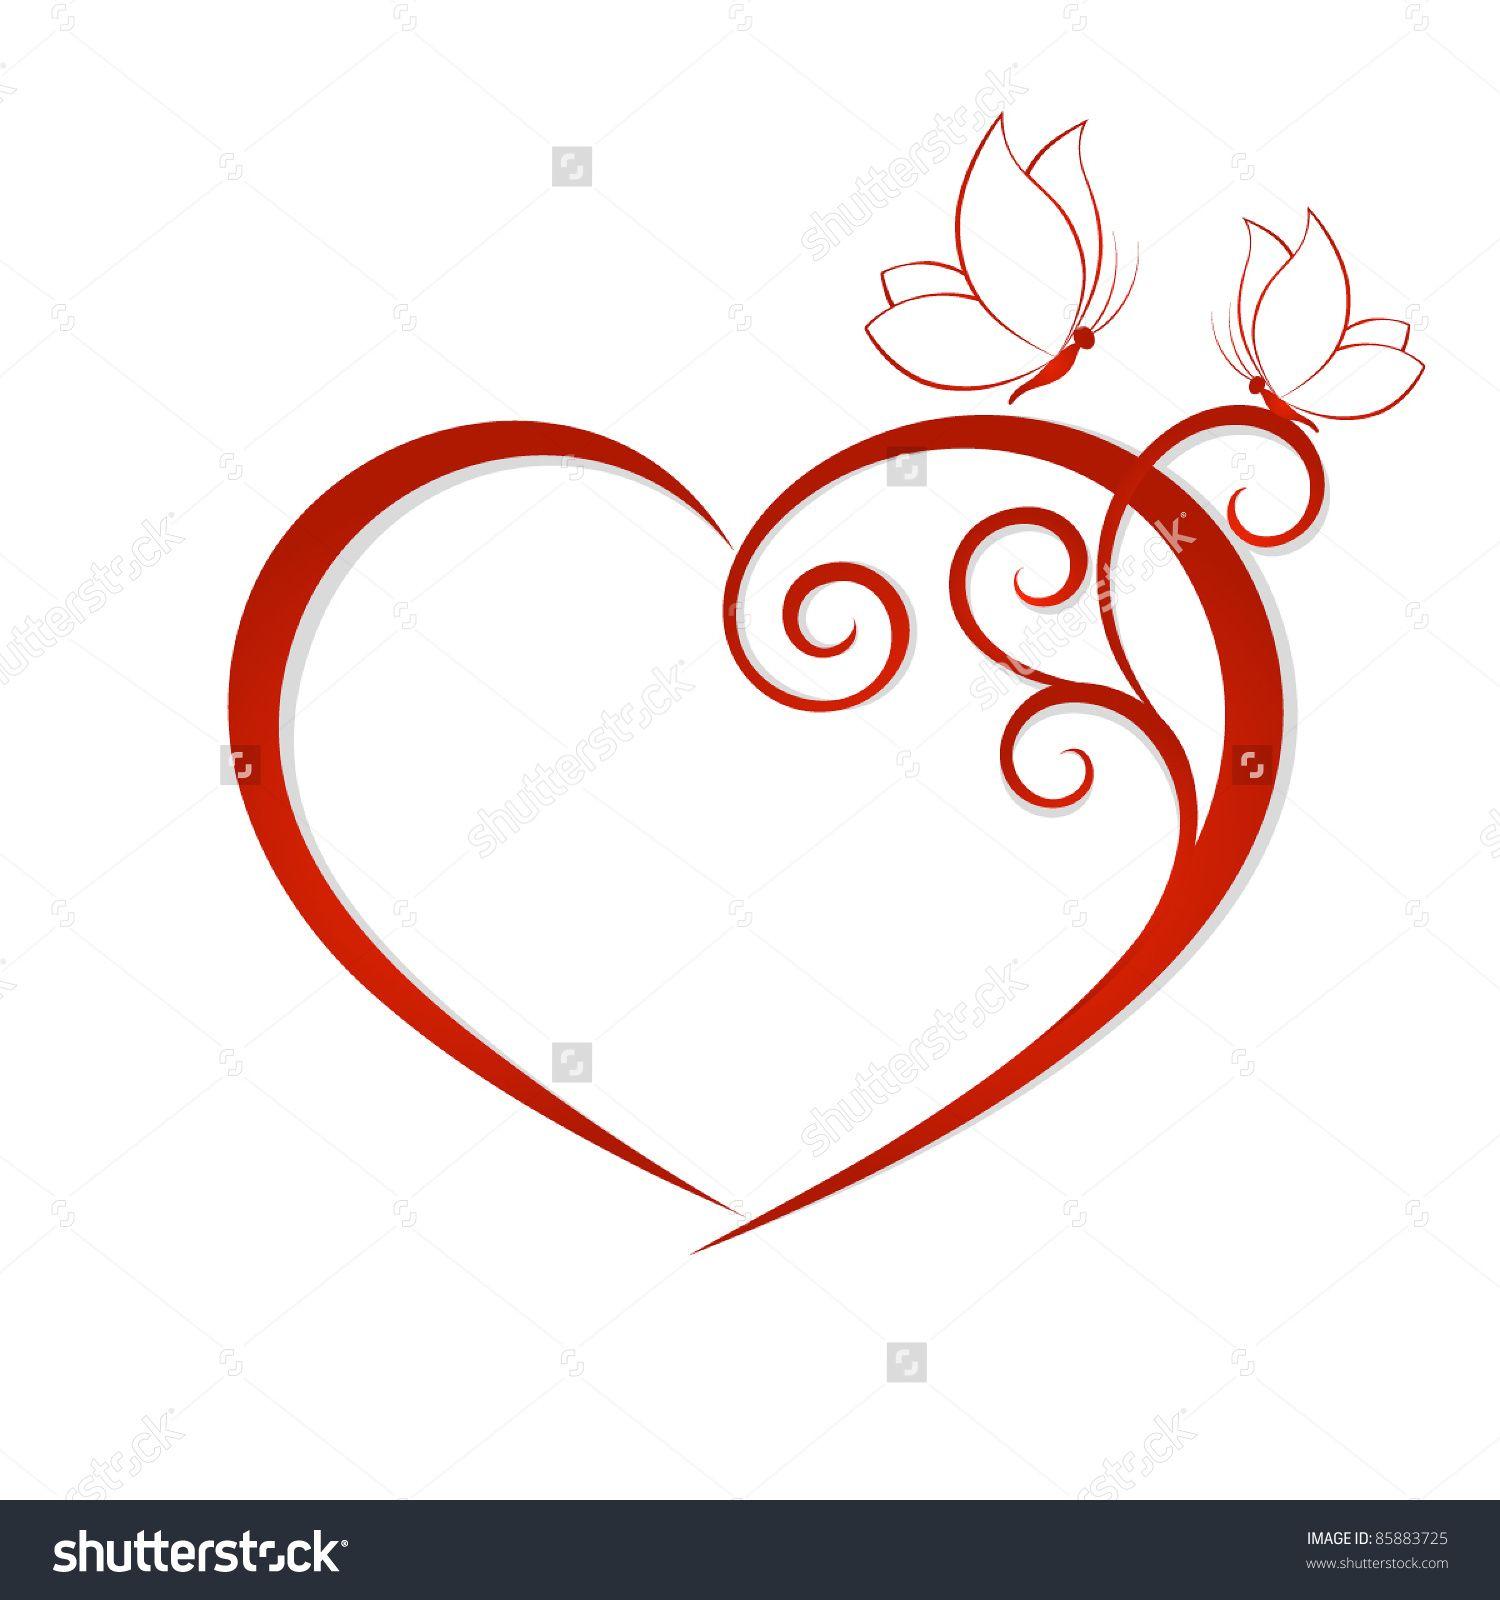 Double heart pics google search alaskan bush people pinterest double heart pics google search voltagebd Choice Image